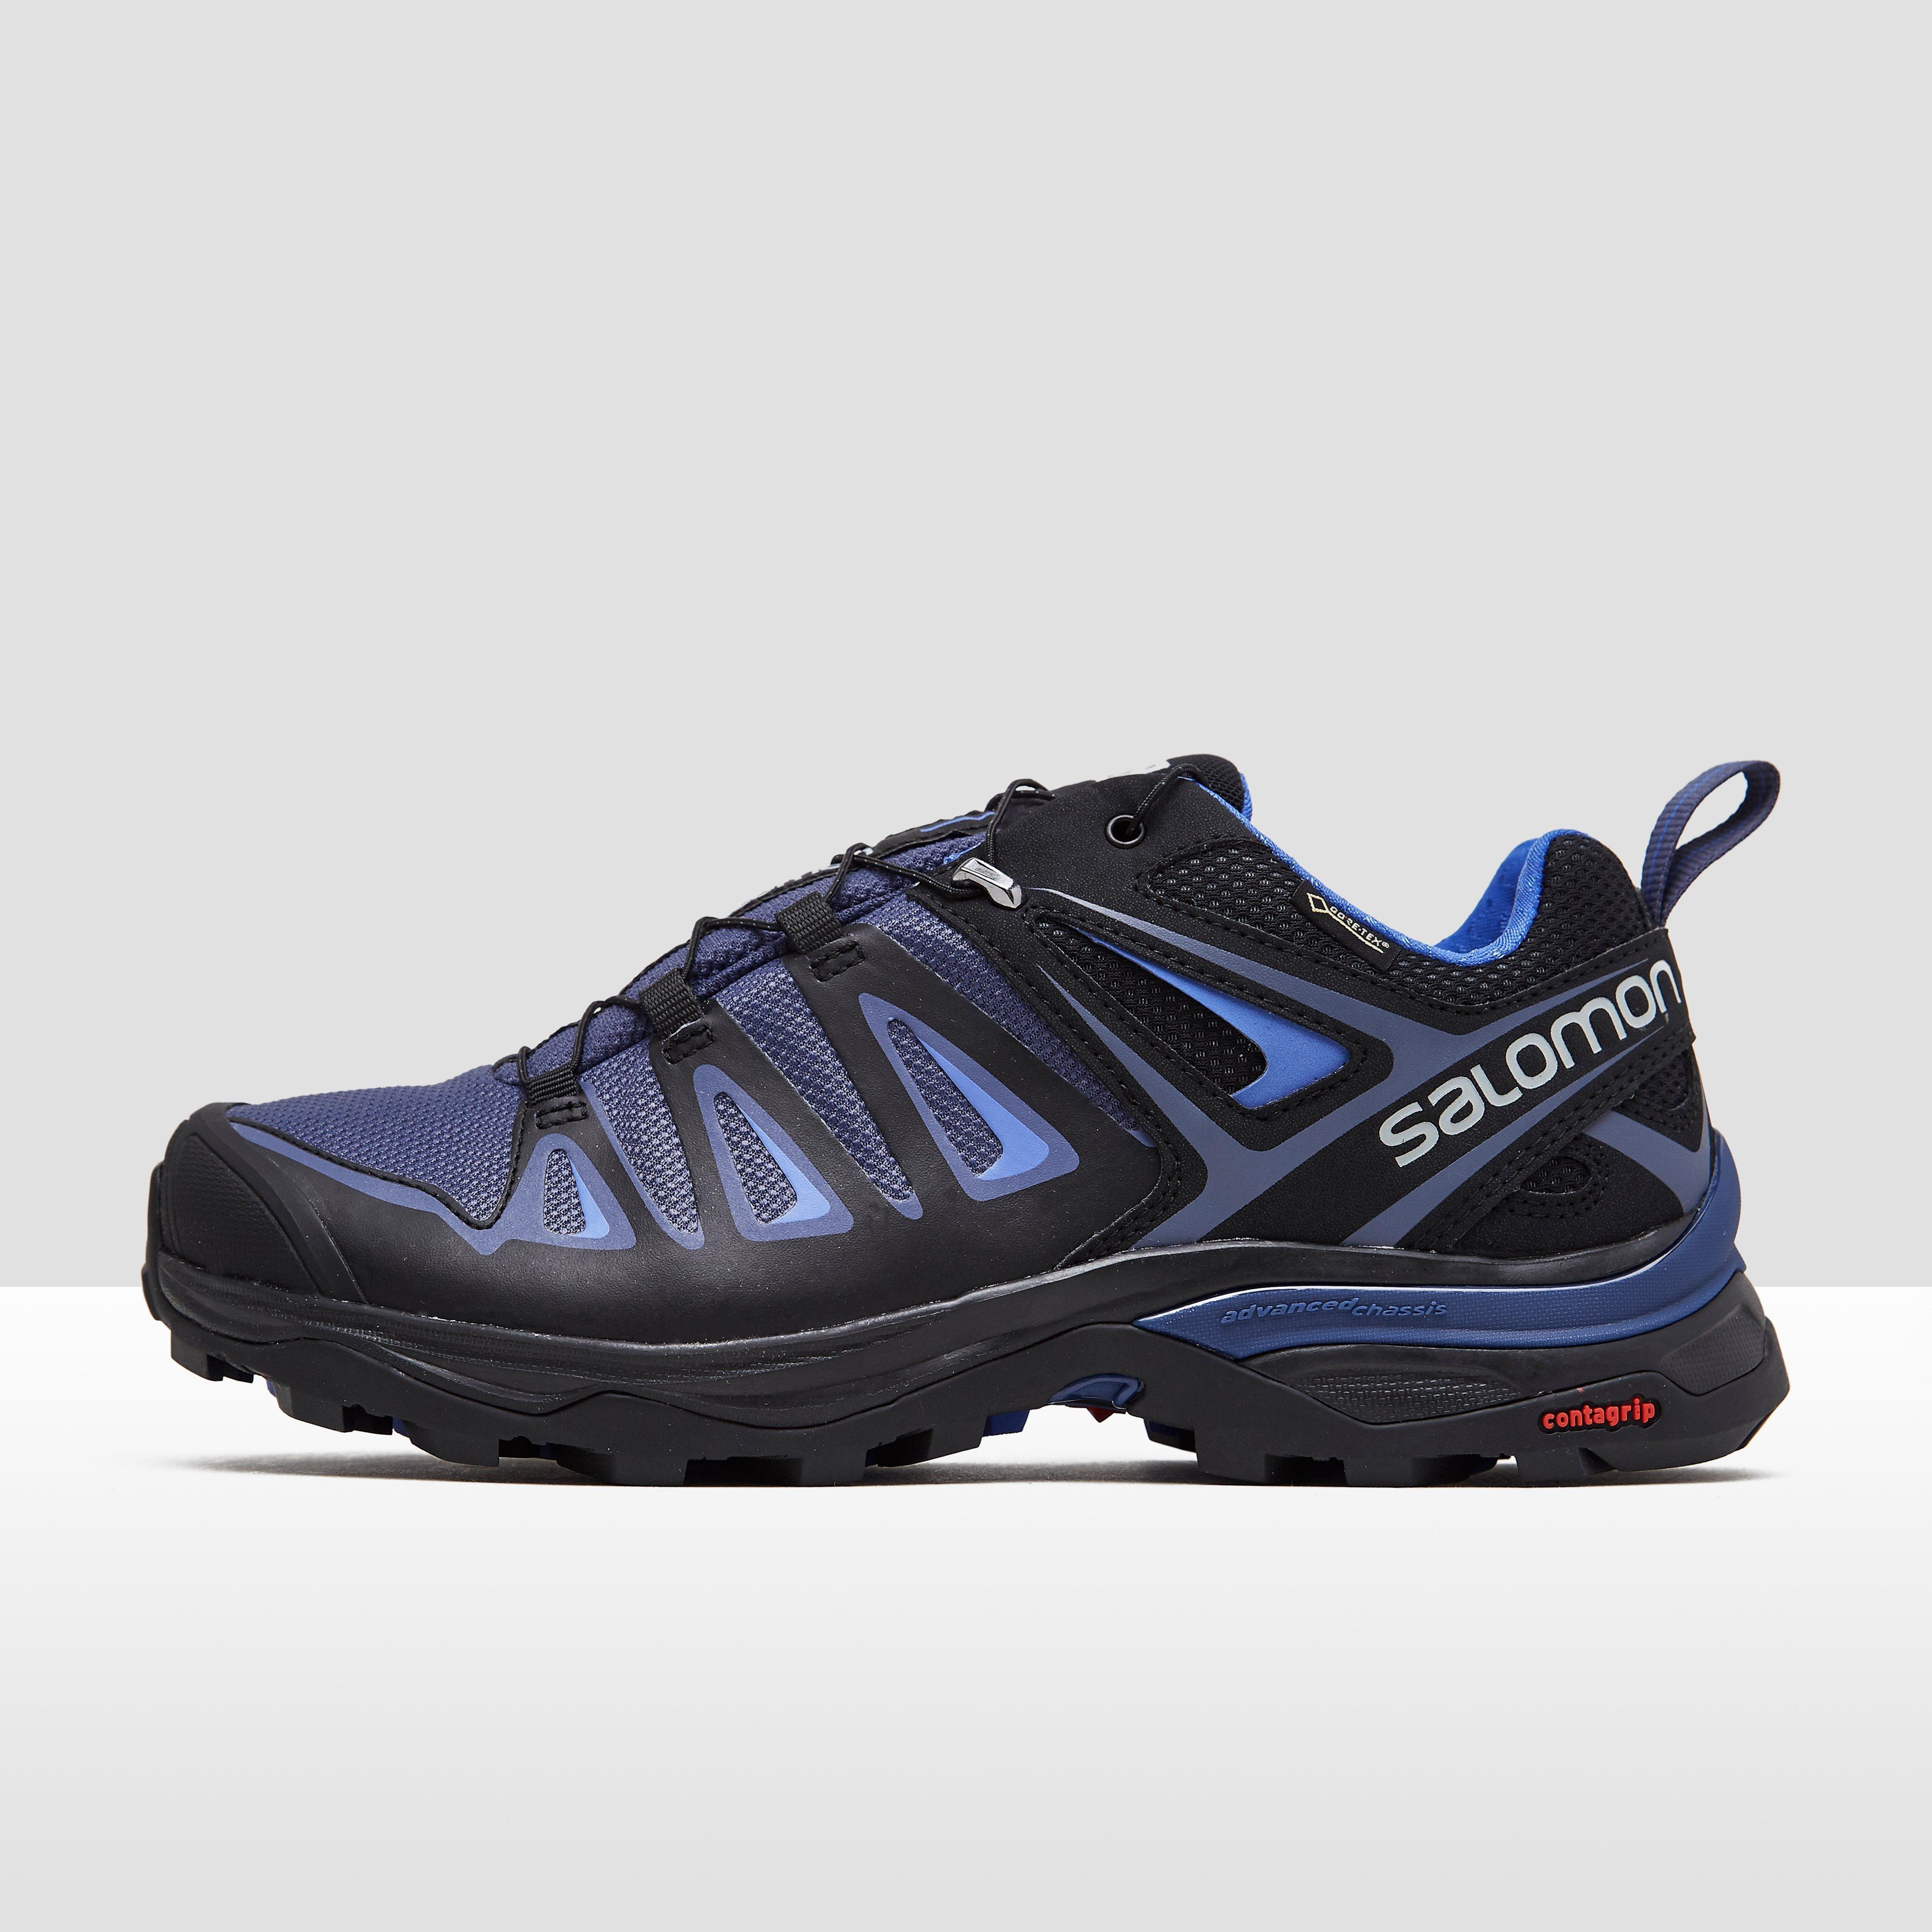 Bleu Chaussures Salomon d8lPlF8